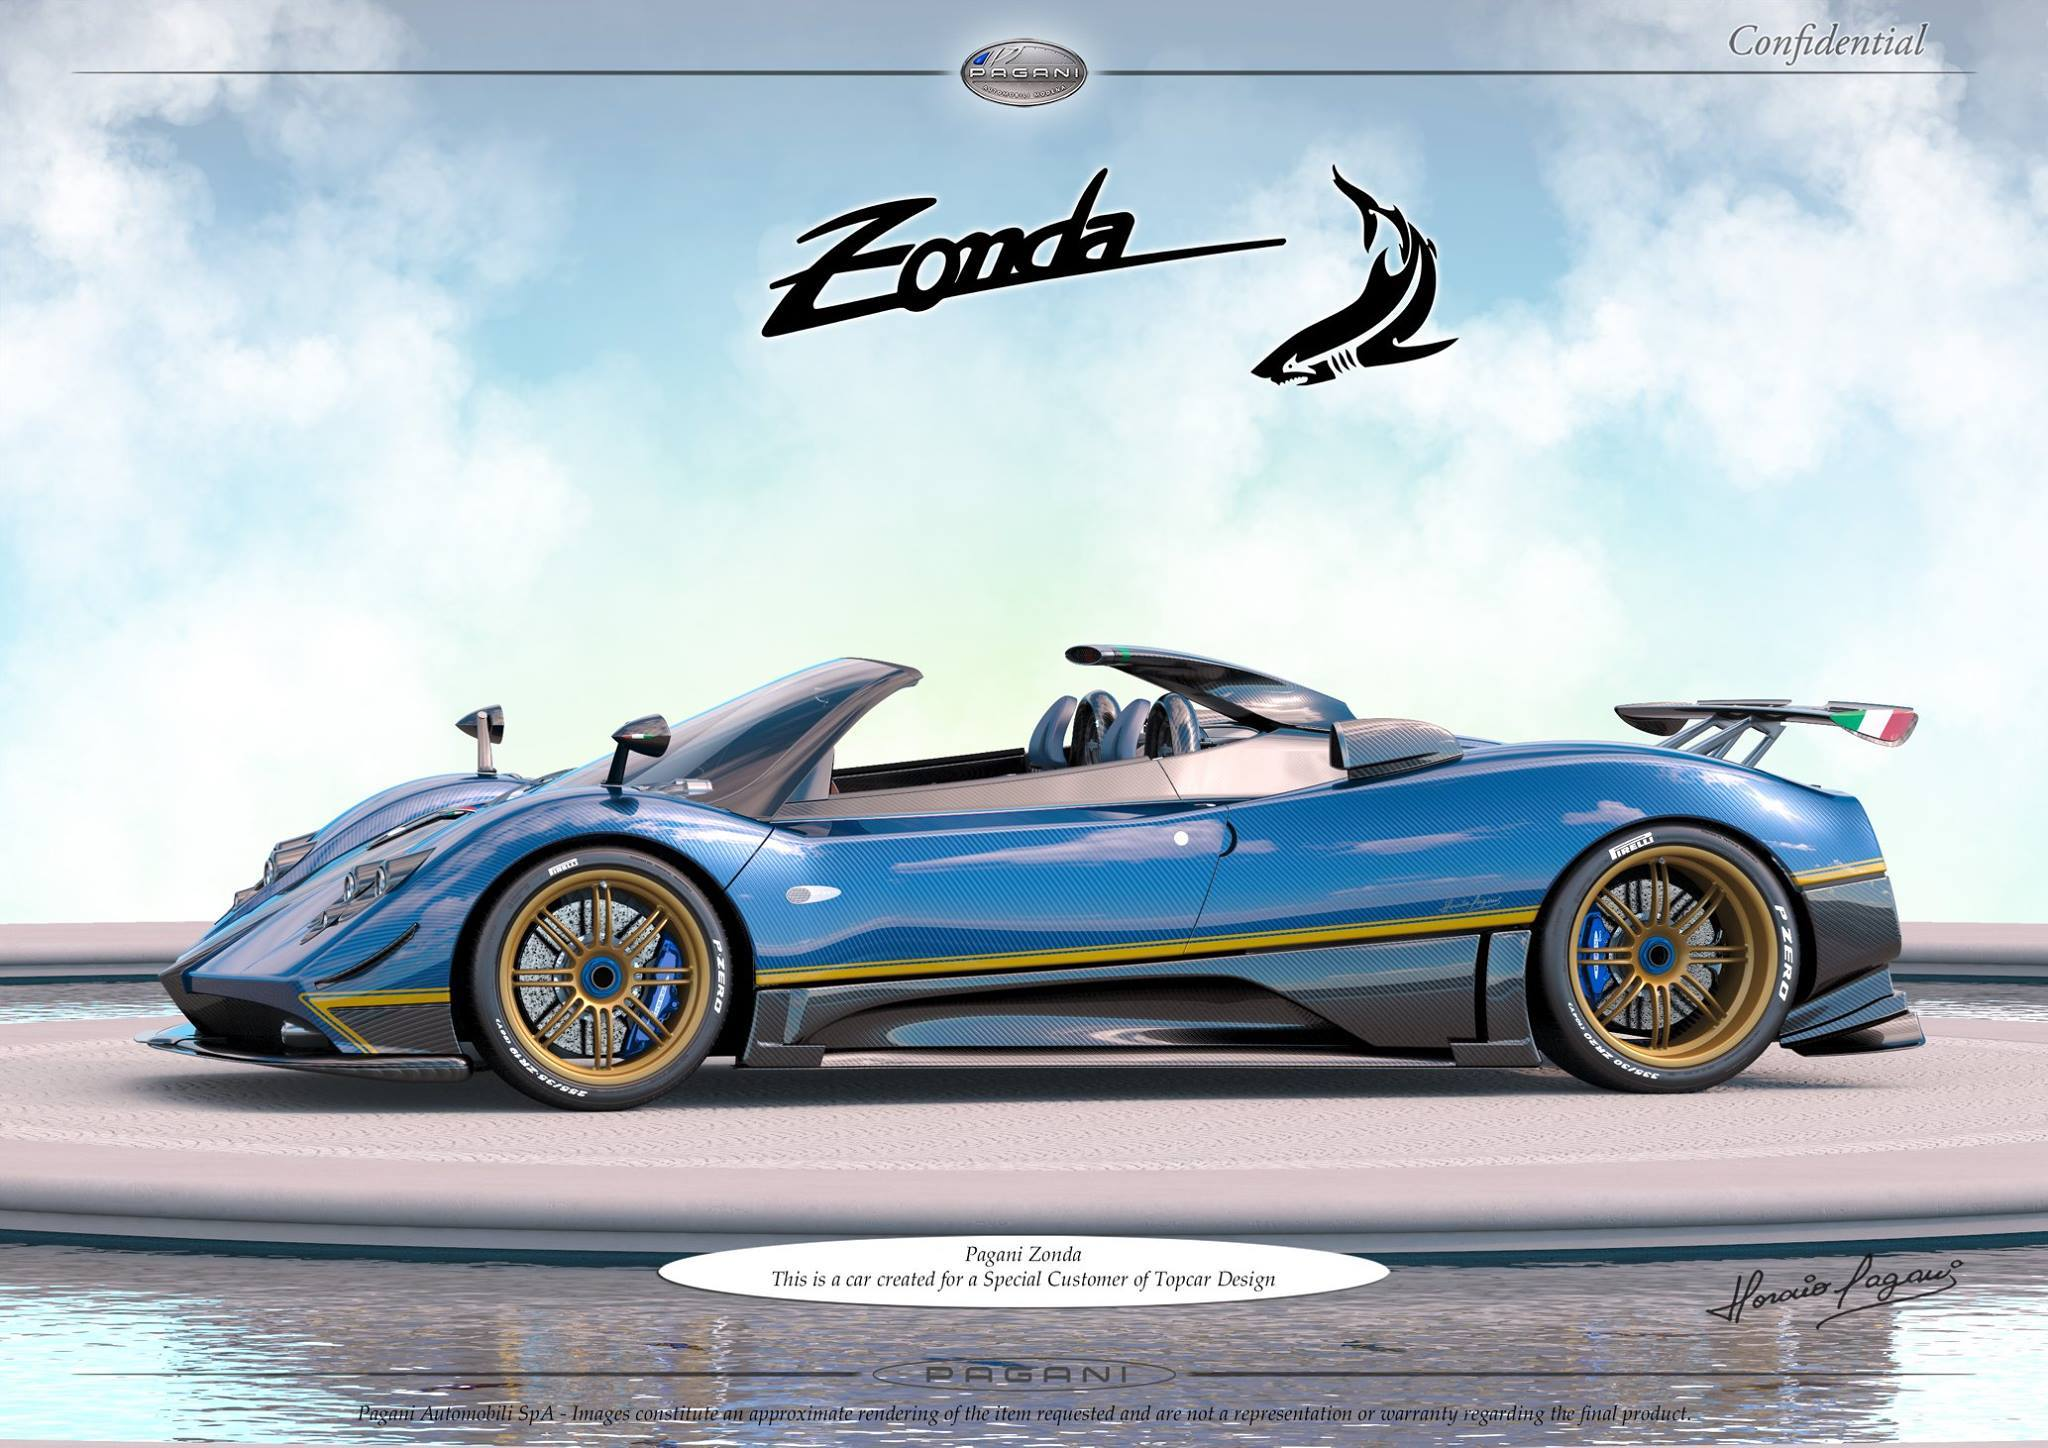 Pagani Creates One-Off Zonda for TopCar Design Customer - GTspirit